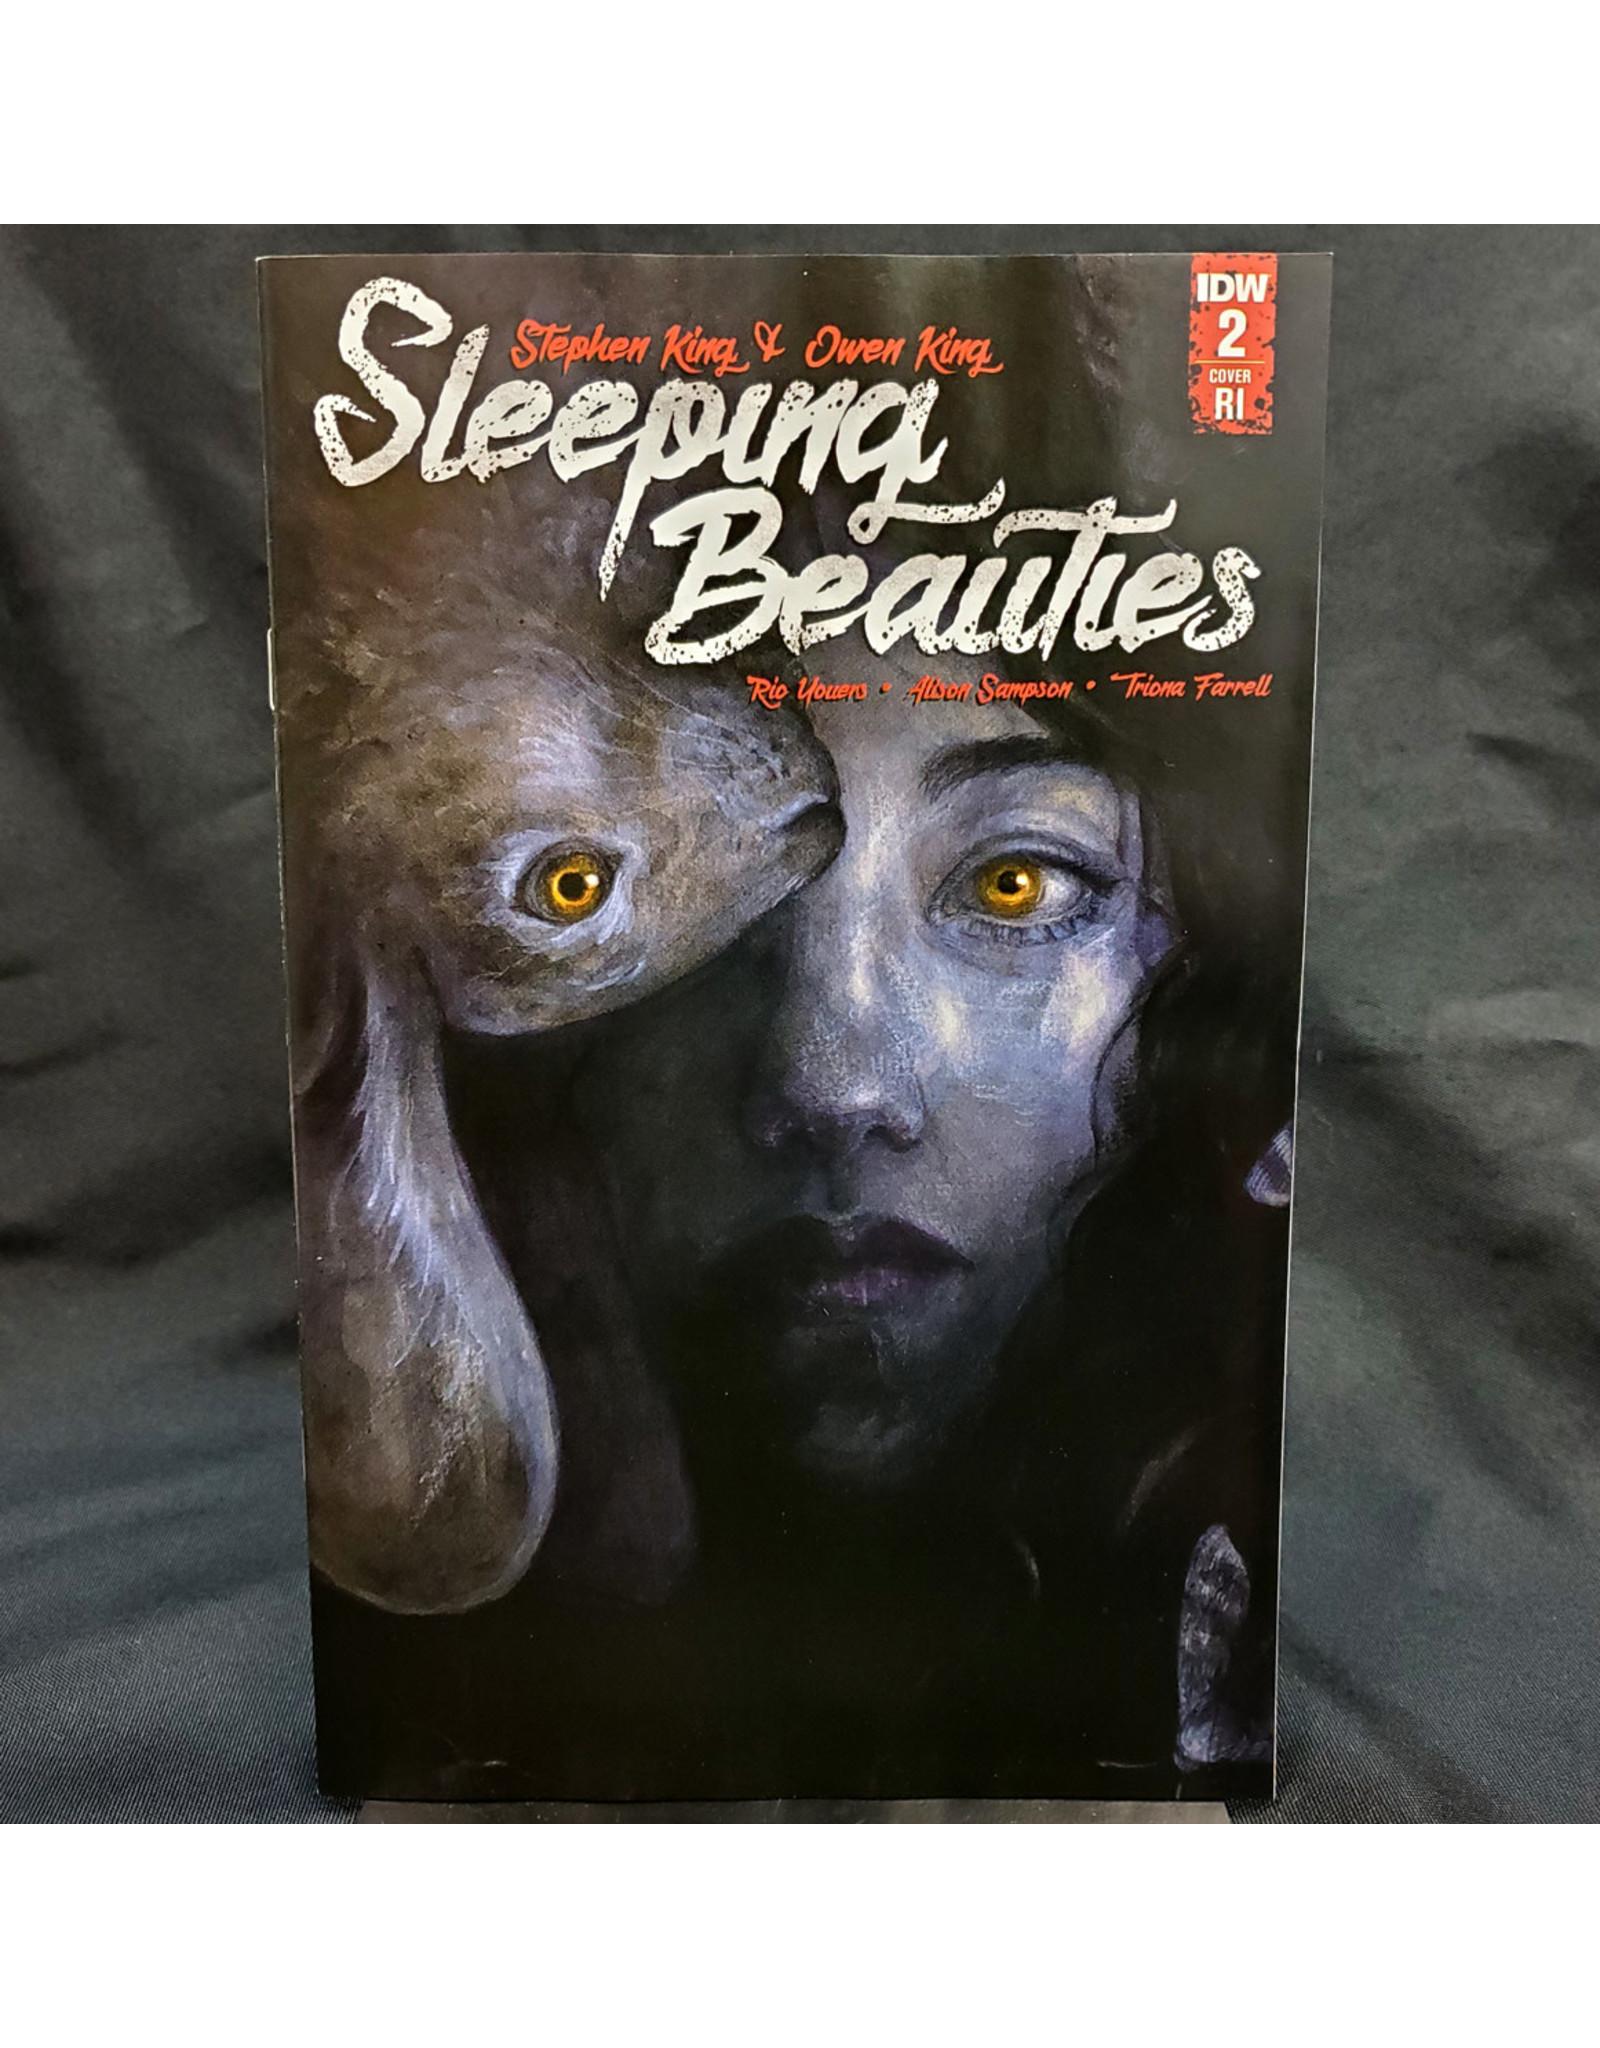 IDW PUBLISHING SLEEPING BEAUTIES #2 (OF 10) 10 COPY INCENTIVE HEIDERSDORF